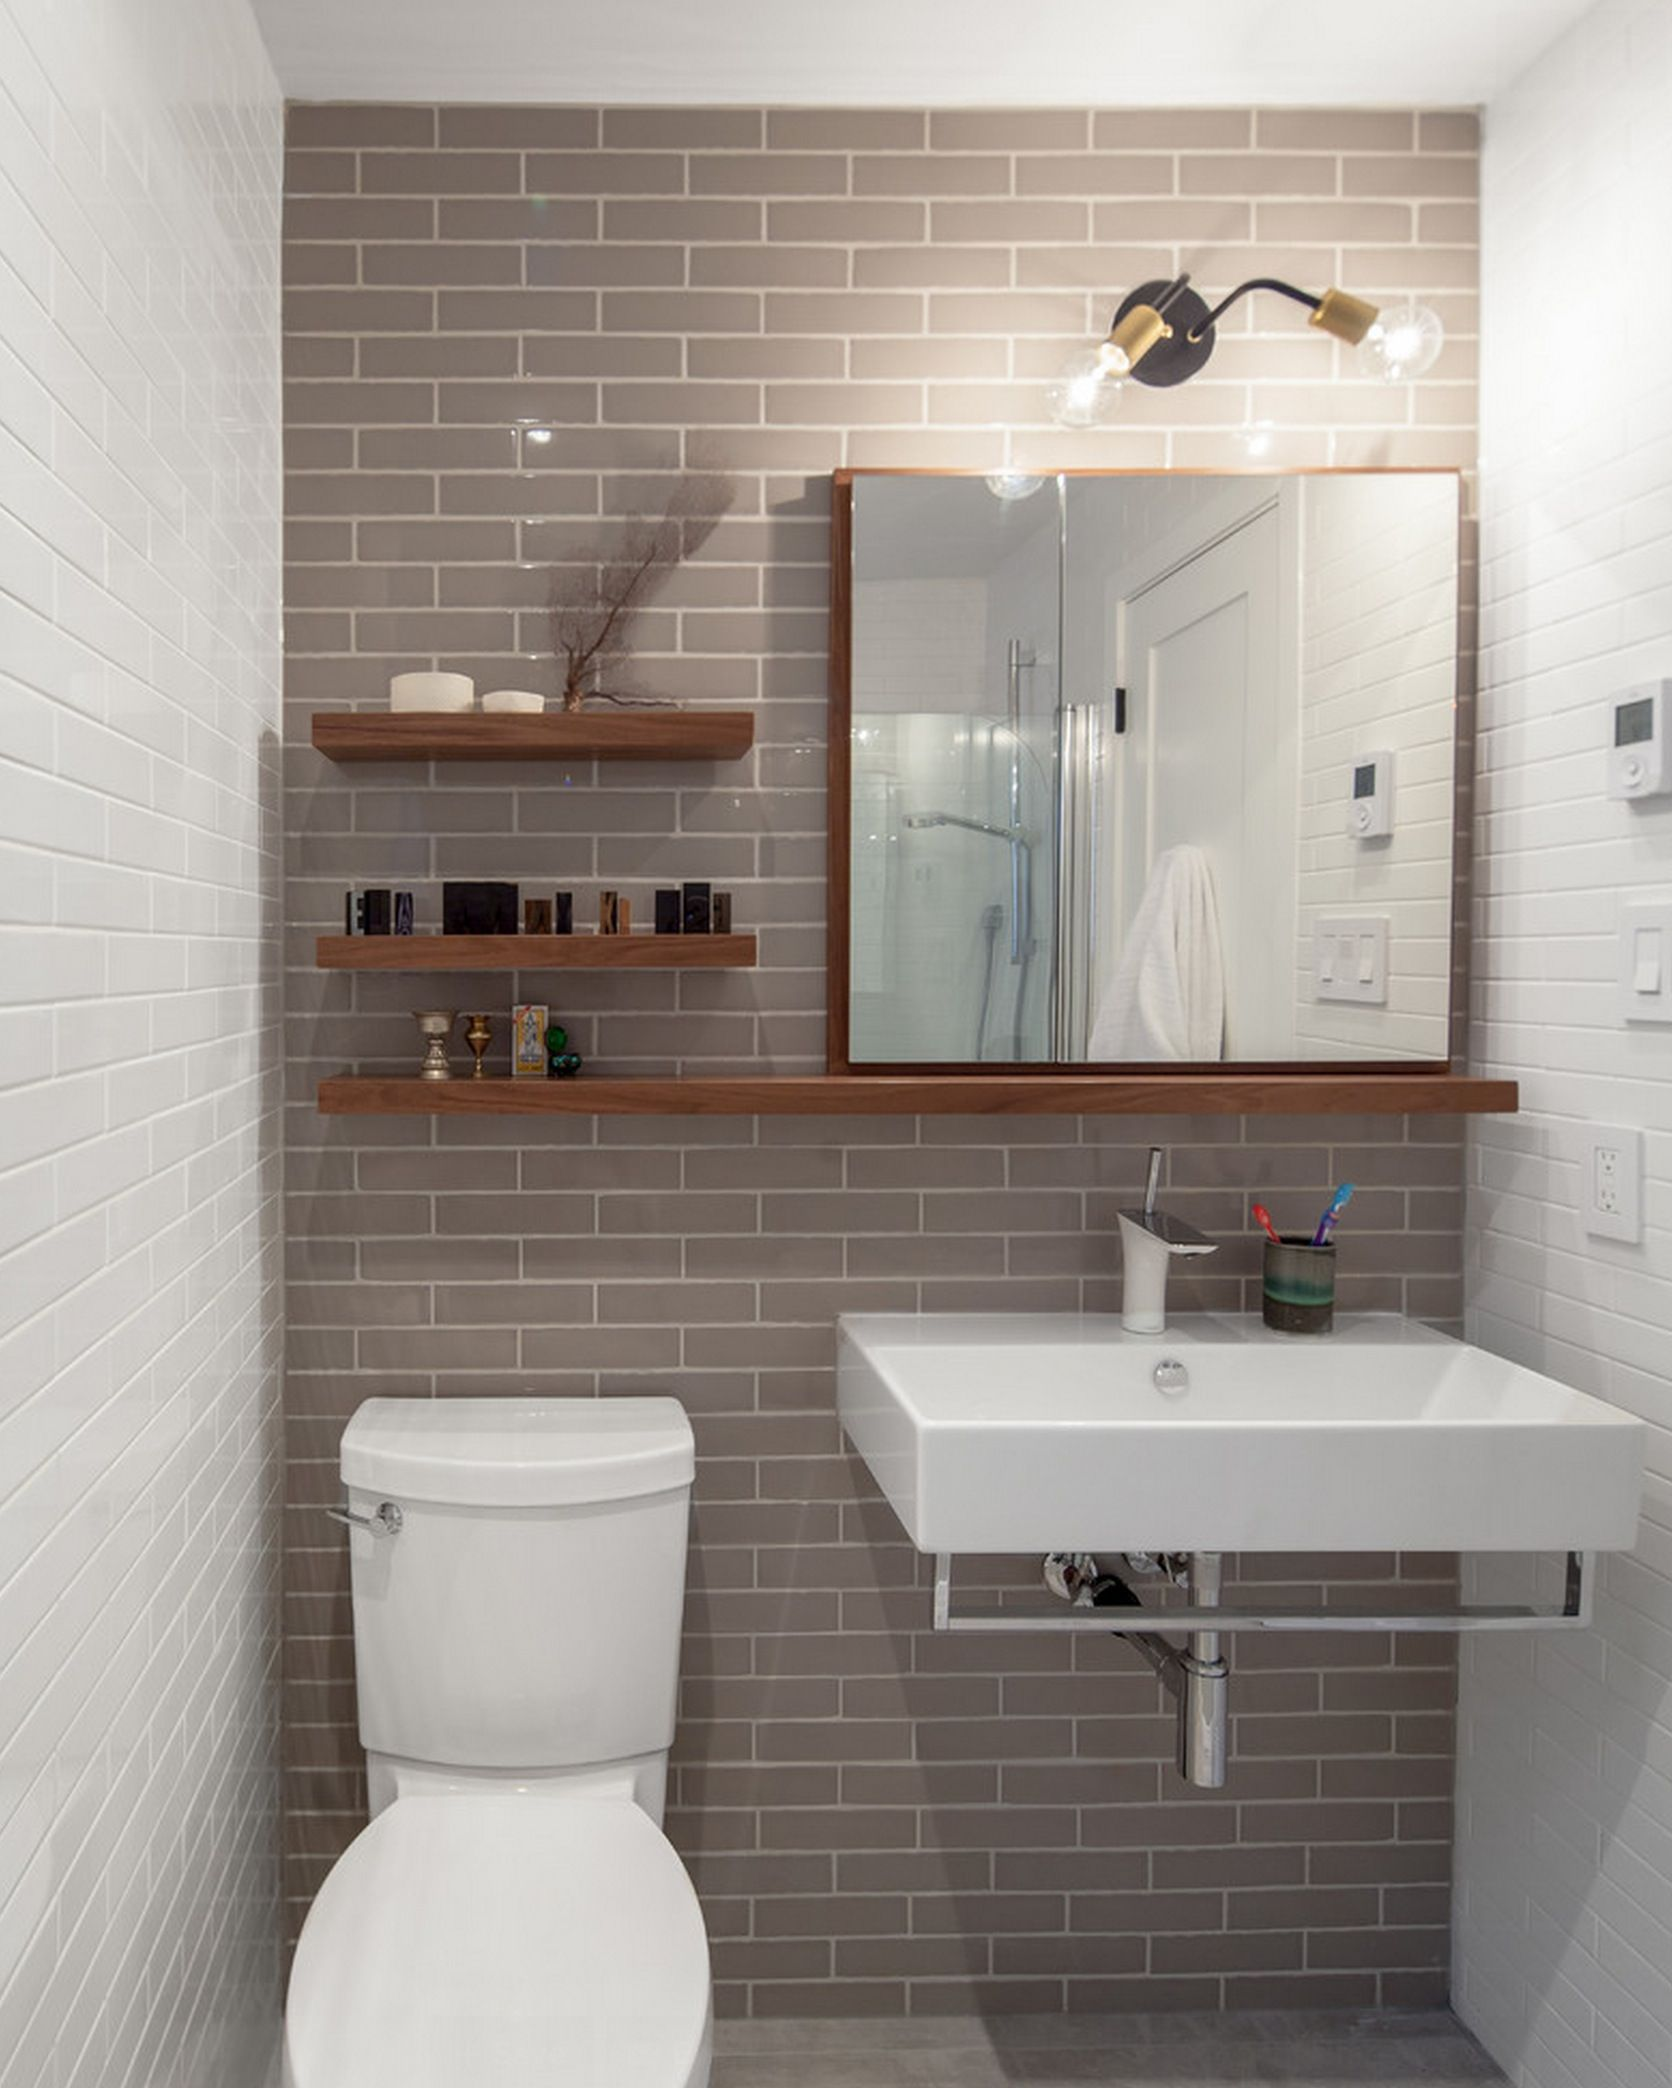 Small Bathroom Bathroom Vanity And Mirror Ideas